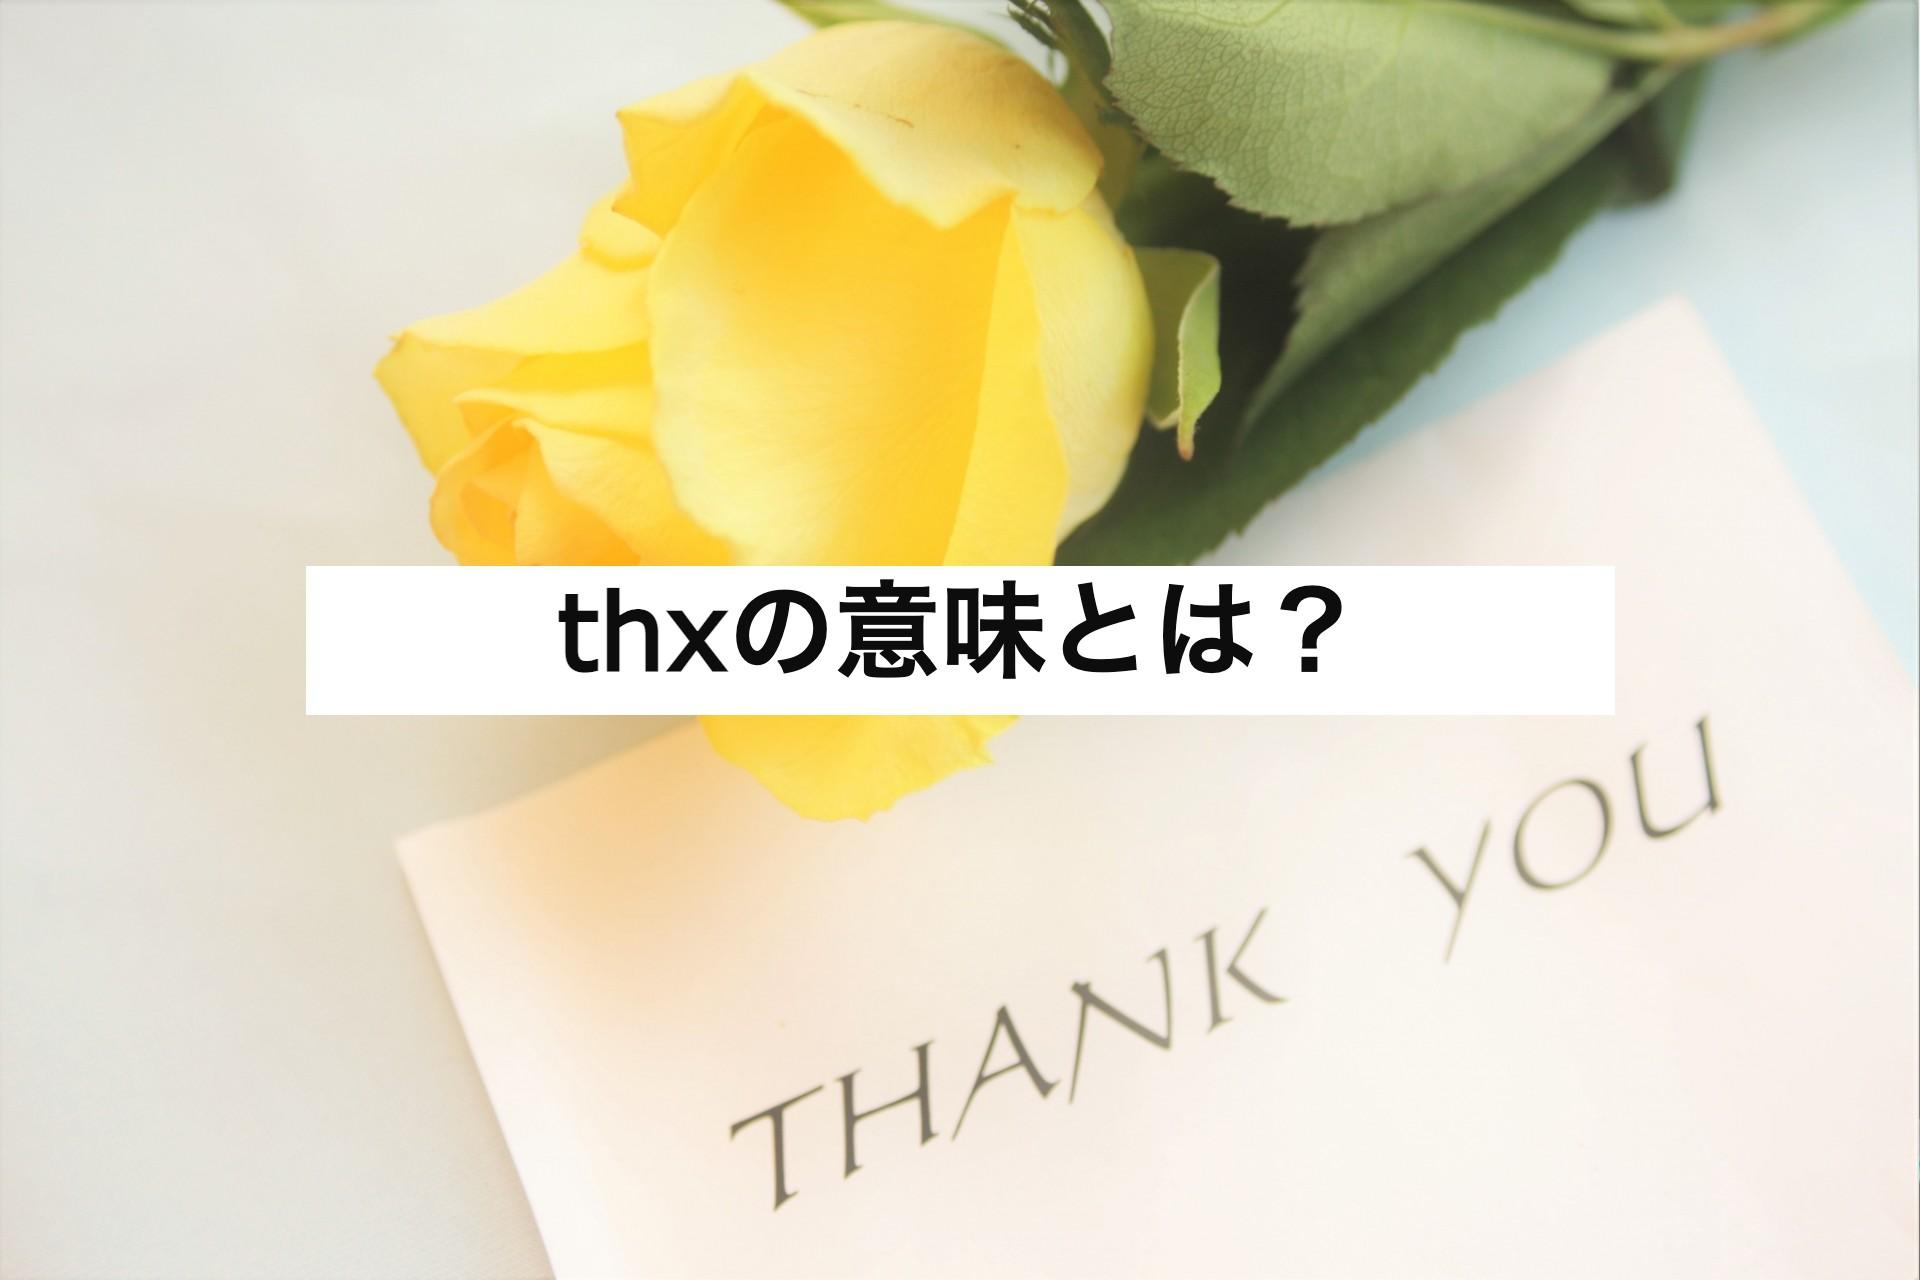 『thx』の意味とは?英語のカジュアルな表現を学ぼう